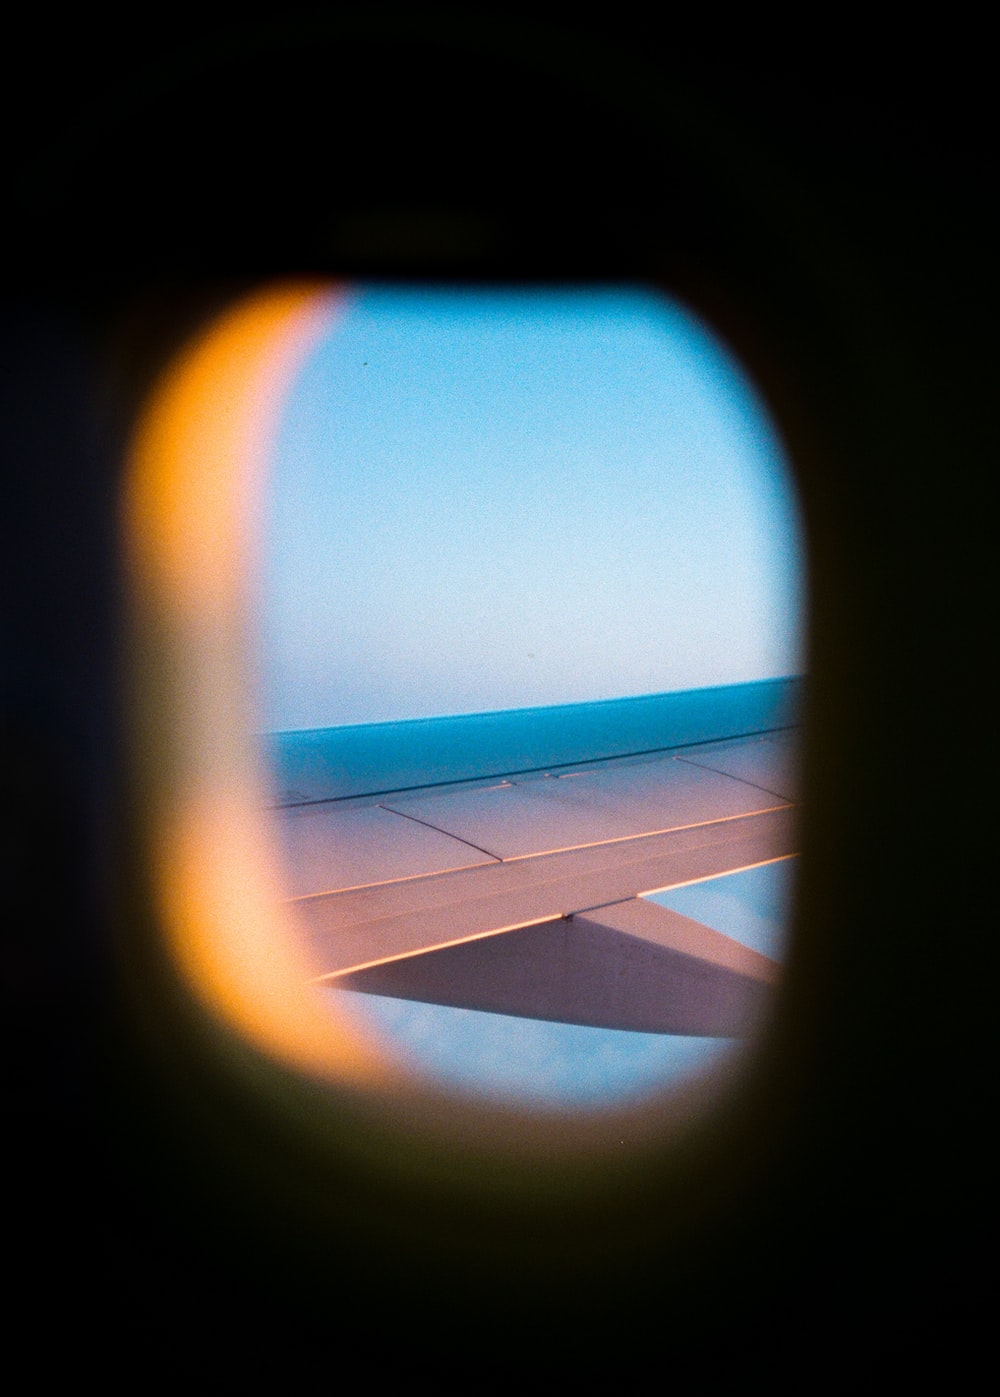 airliner window